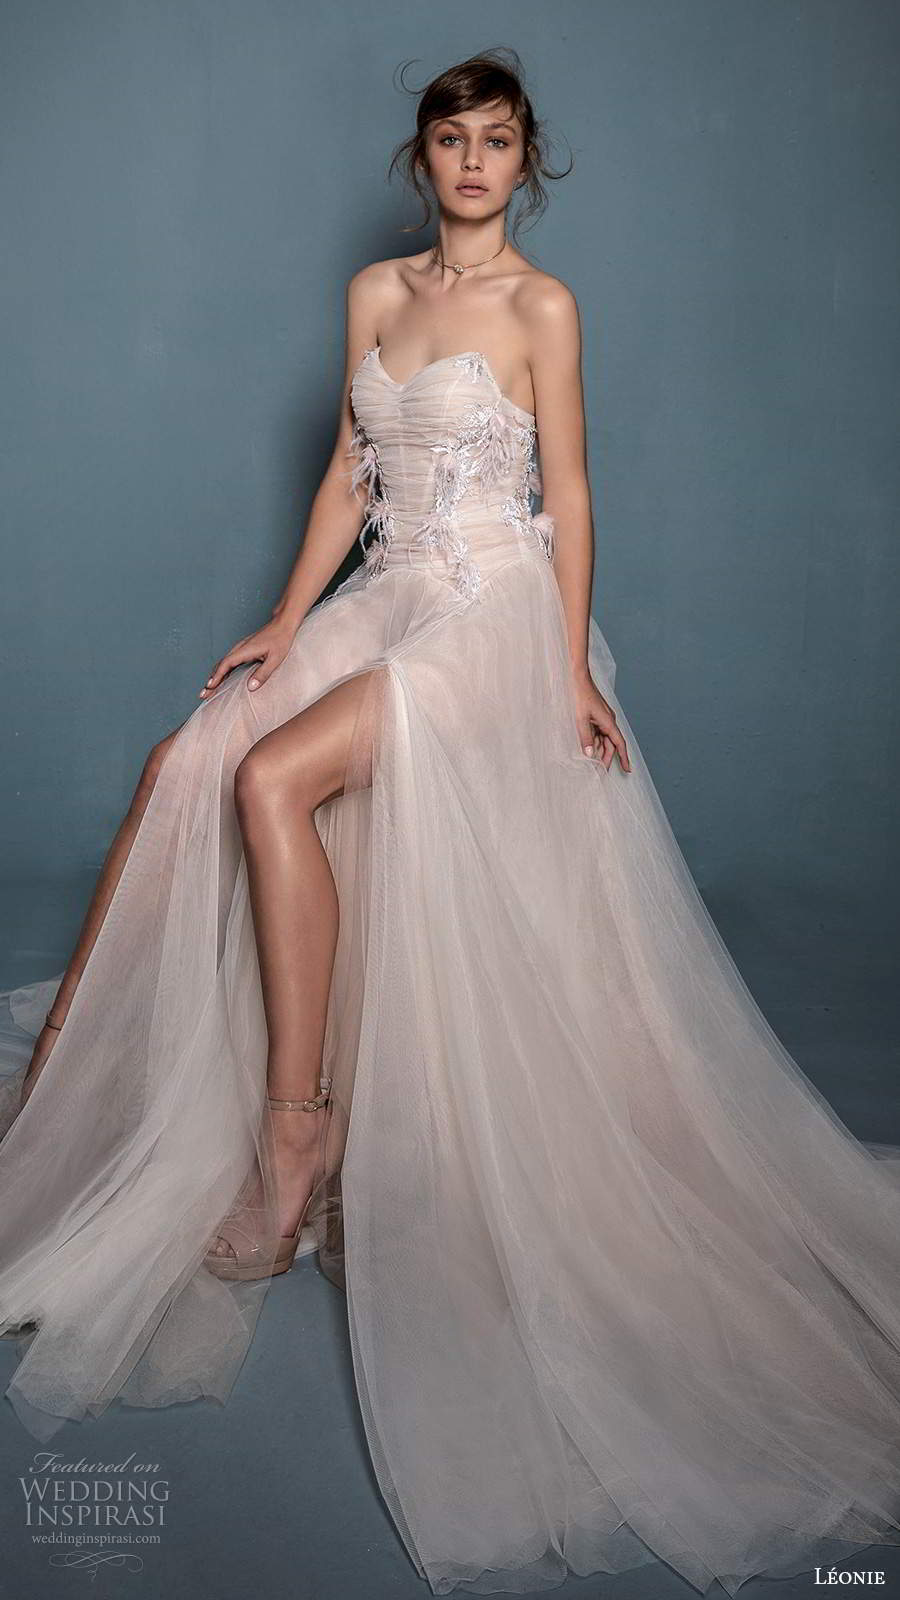 leonie bridal 2020 bridal strapless sweetheart neckline ruched bodice a line ball gown wedding dress chapel train slit skirt (5) mv